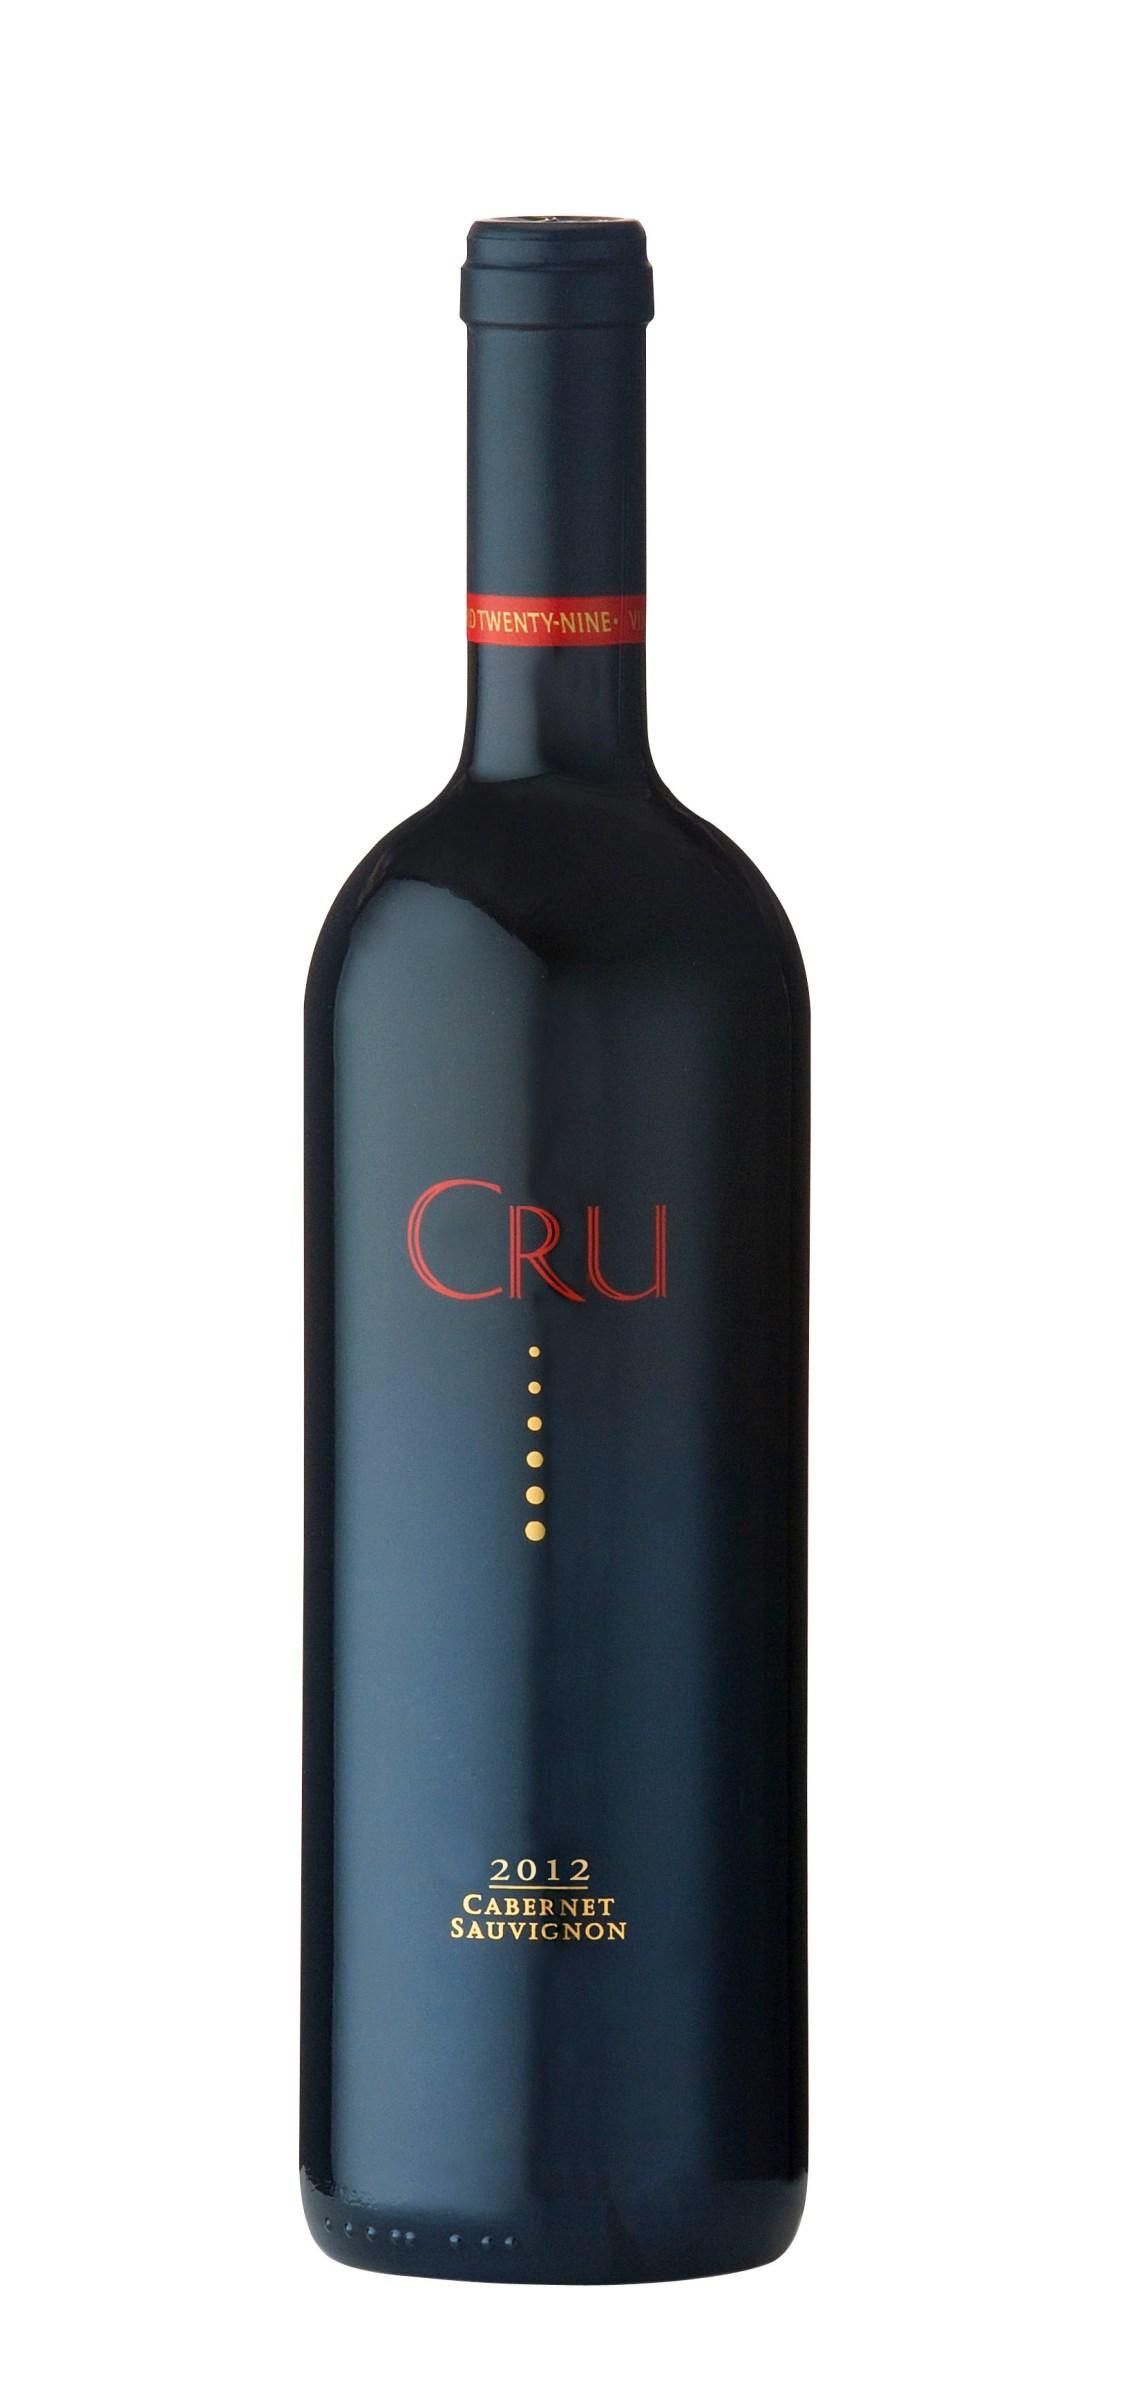 2012 Vineyard 29 Cru Cabernet Sauvignon Napa Valley